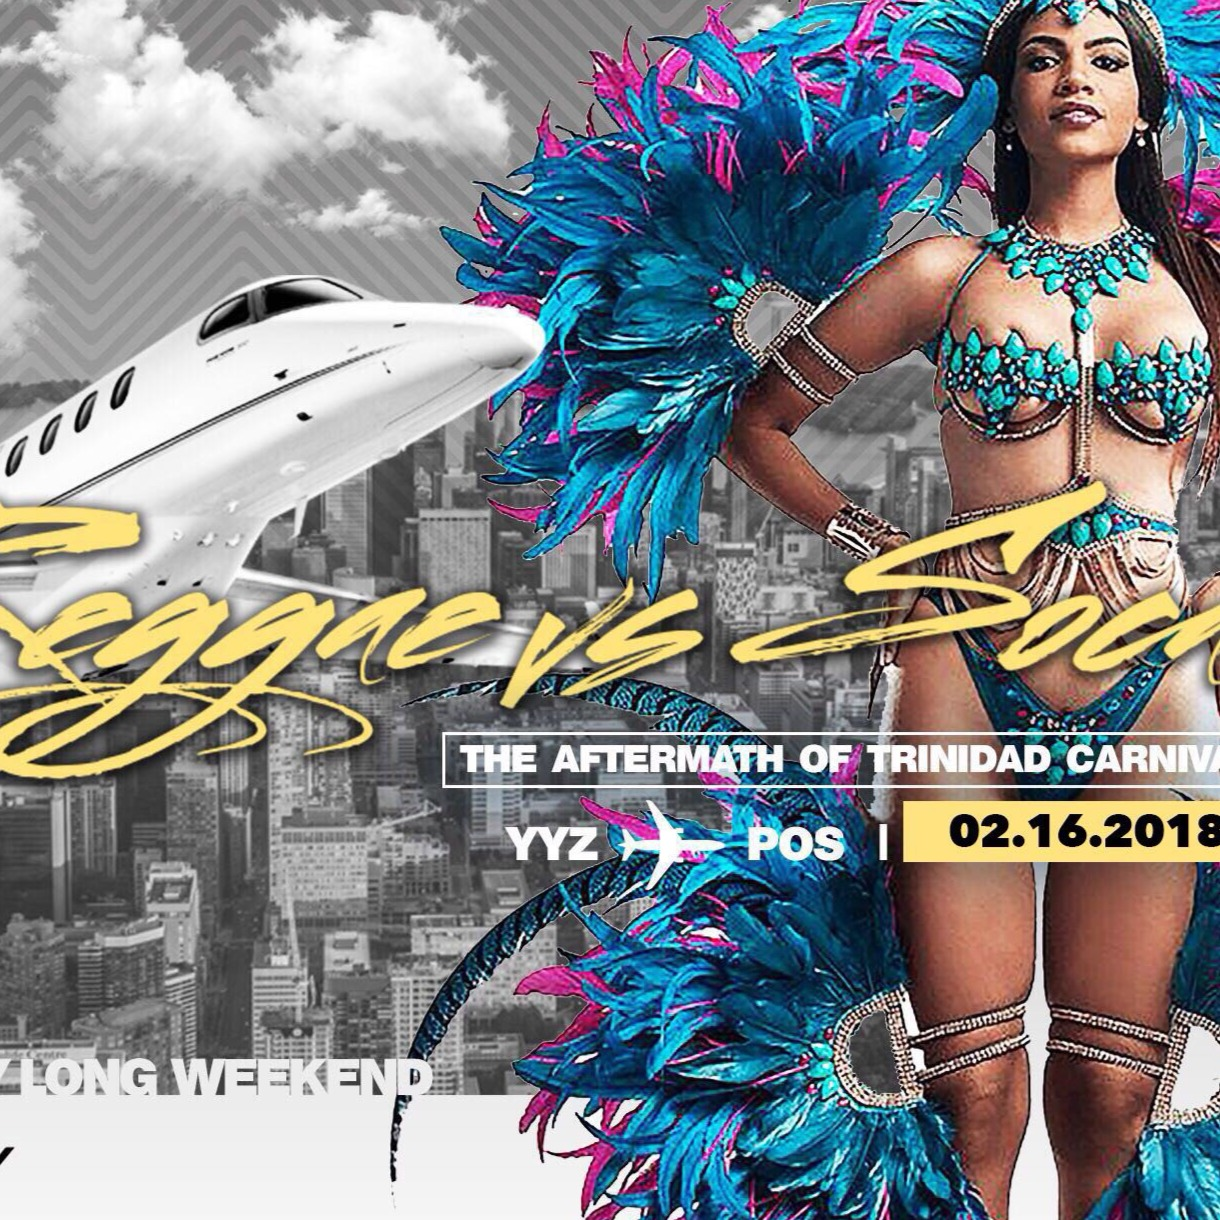 Reggae Vs Soca - The Aftermath Of Trinidad Carnival | 02.16.18